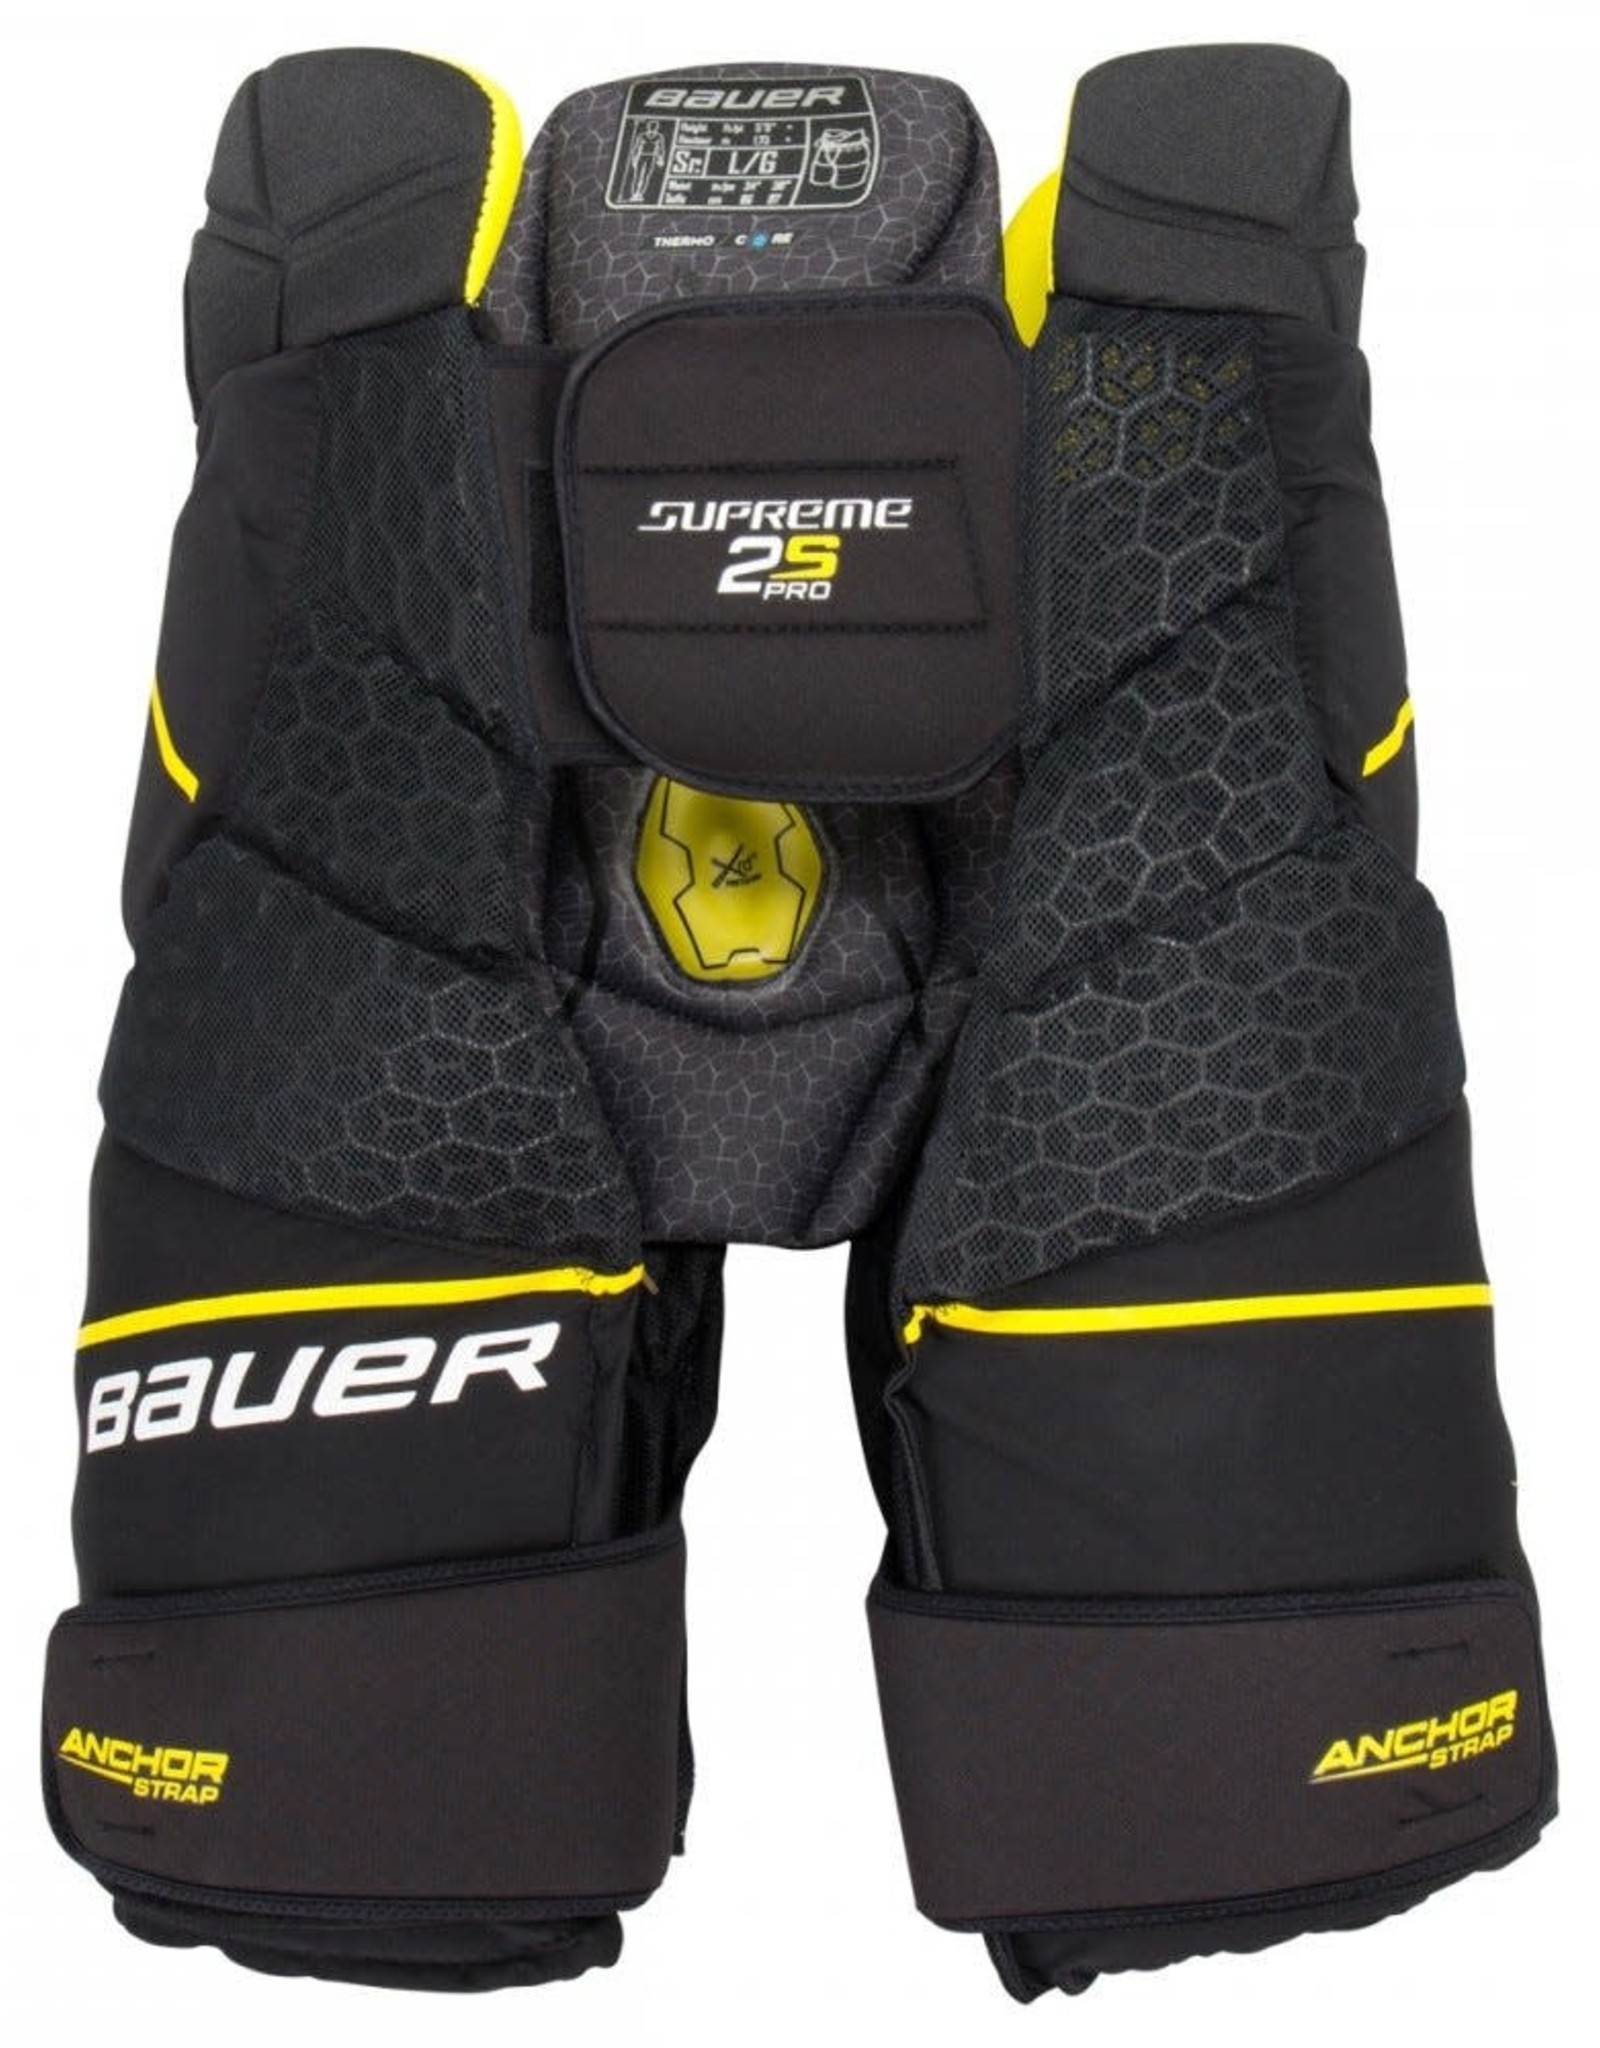 Bauer SUPREME 2S PRO GIRDLE